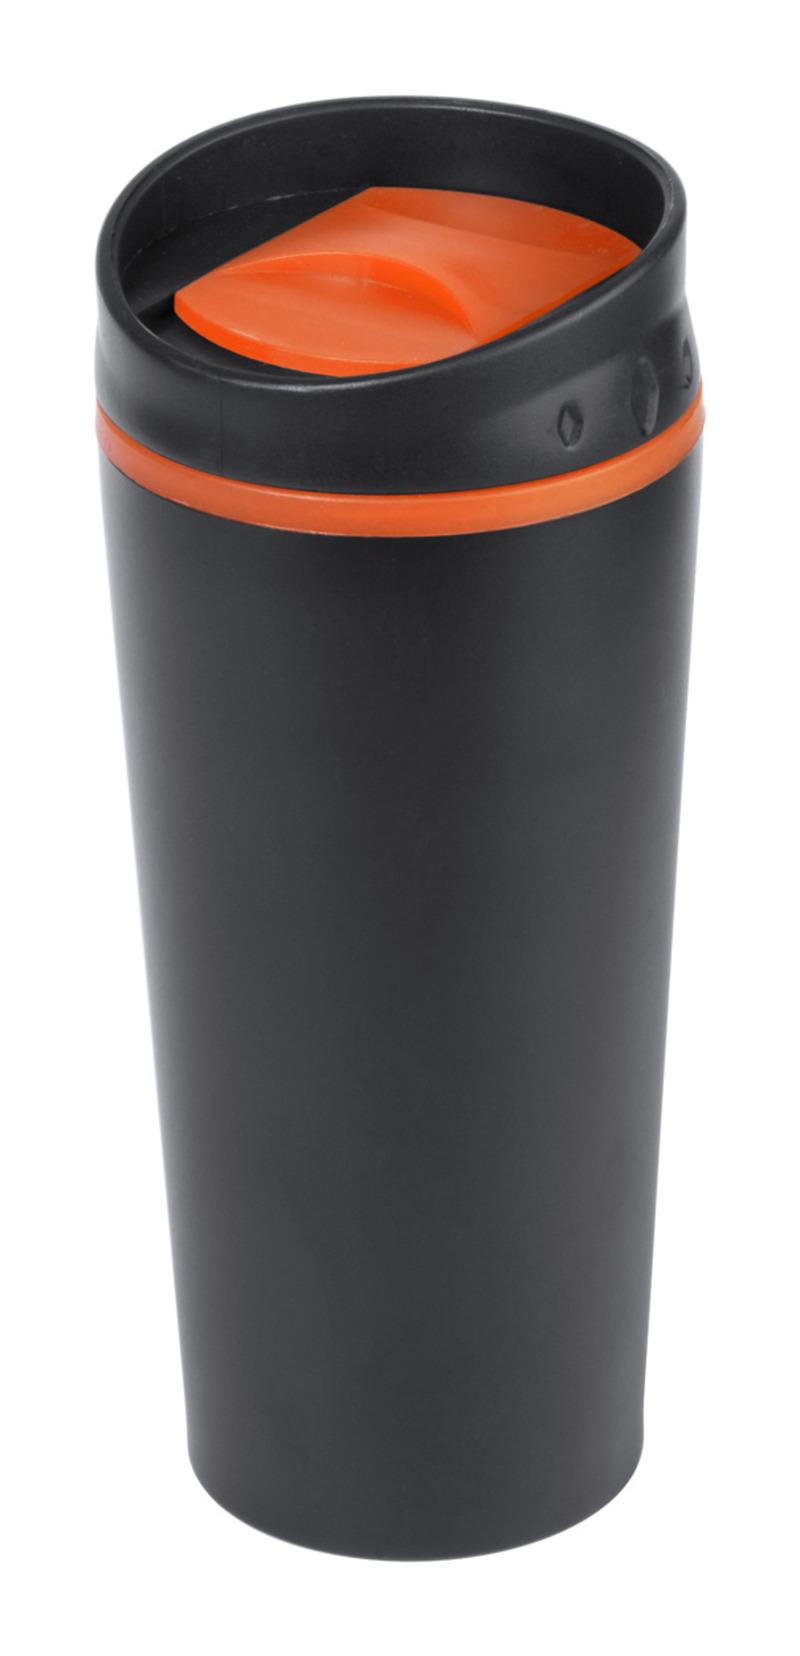 Katel thermo mug